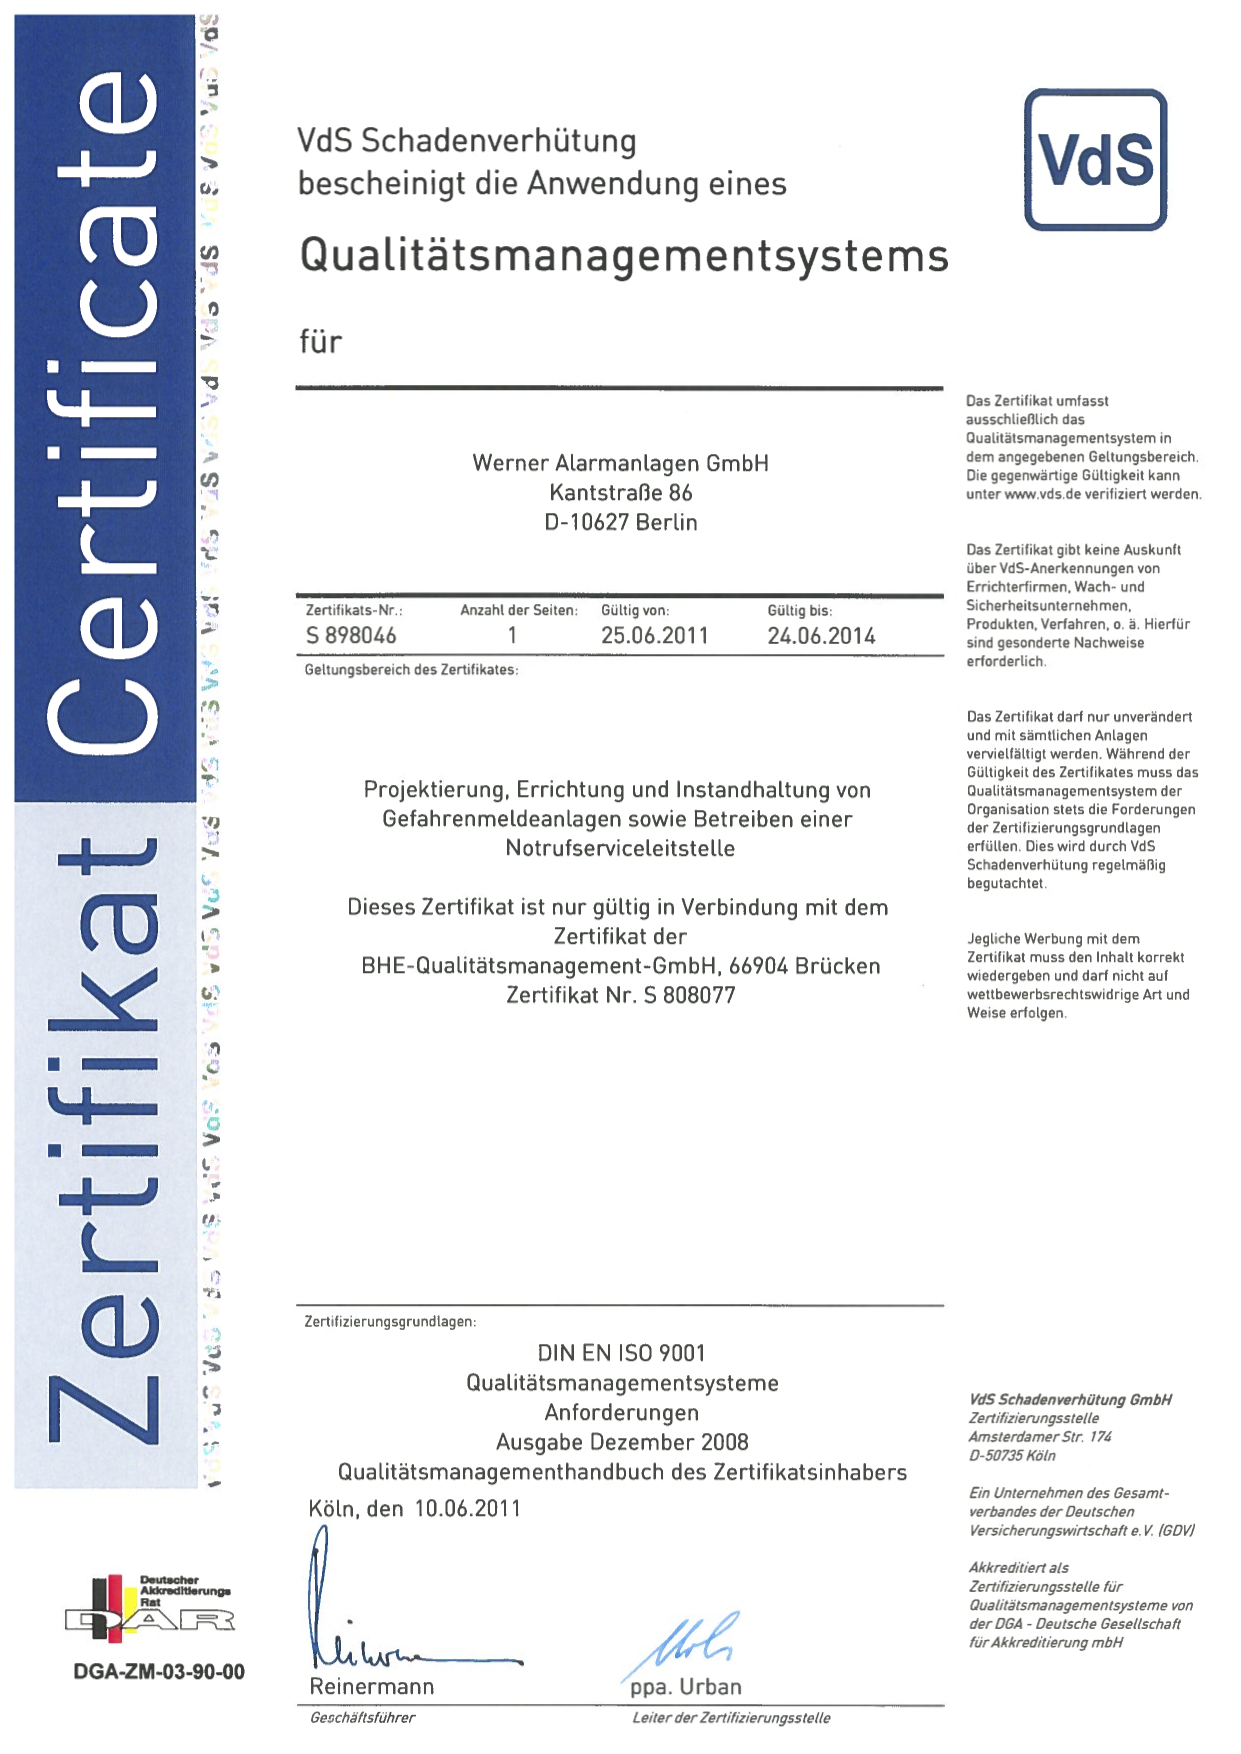 VdS Zertifikat für Qualitätsmanagement